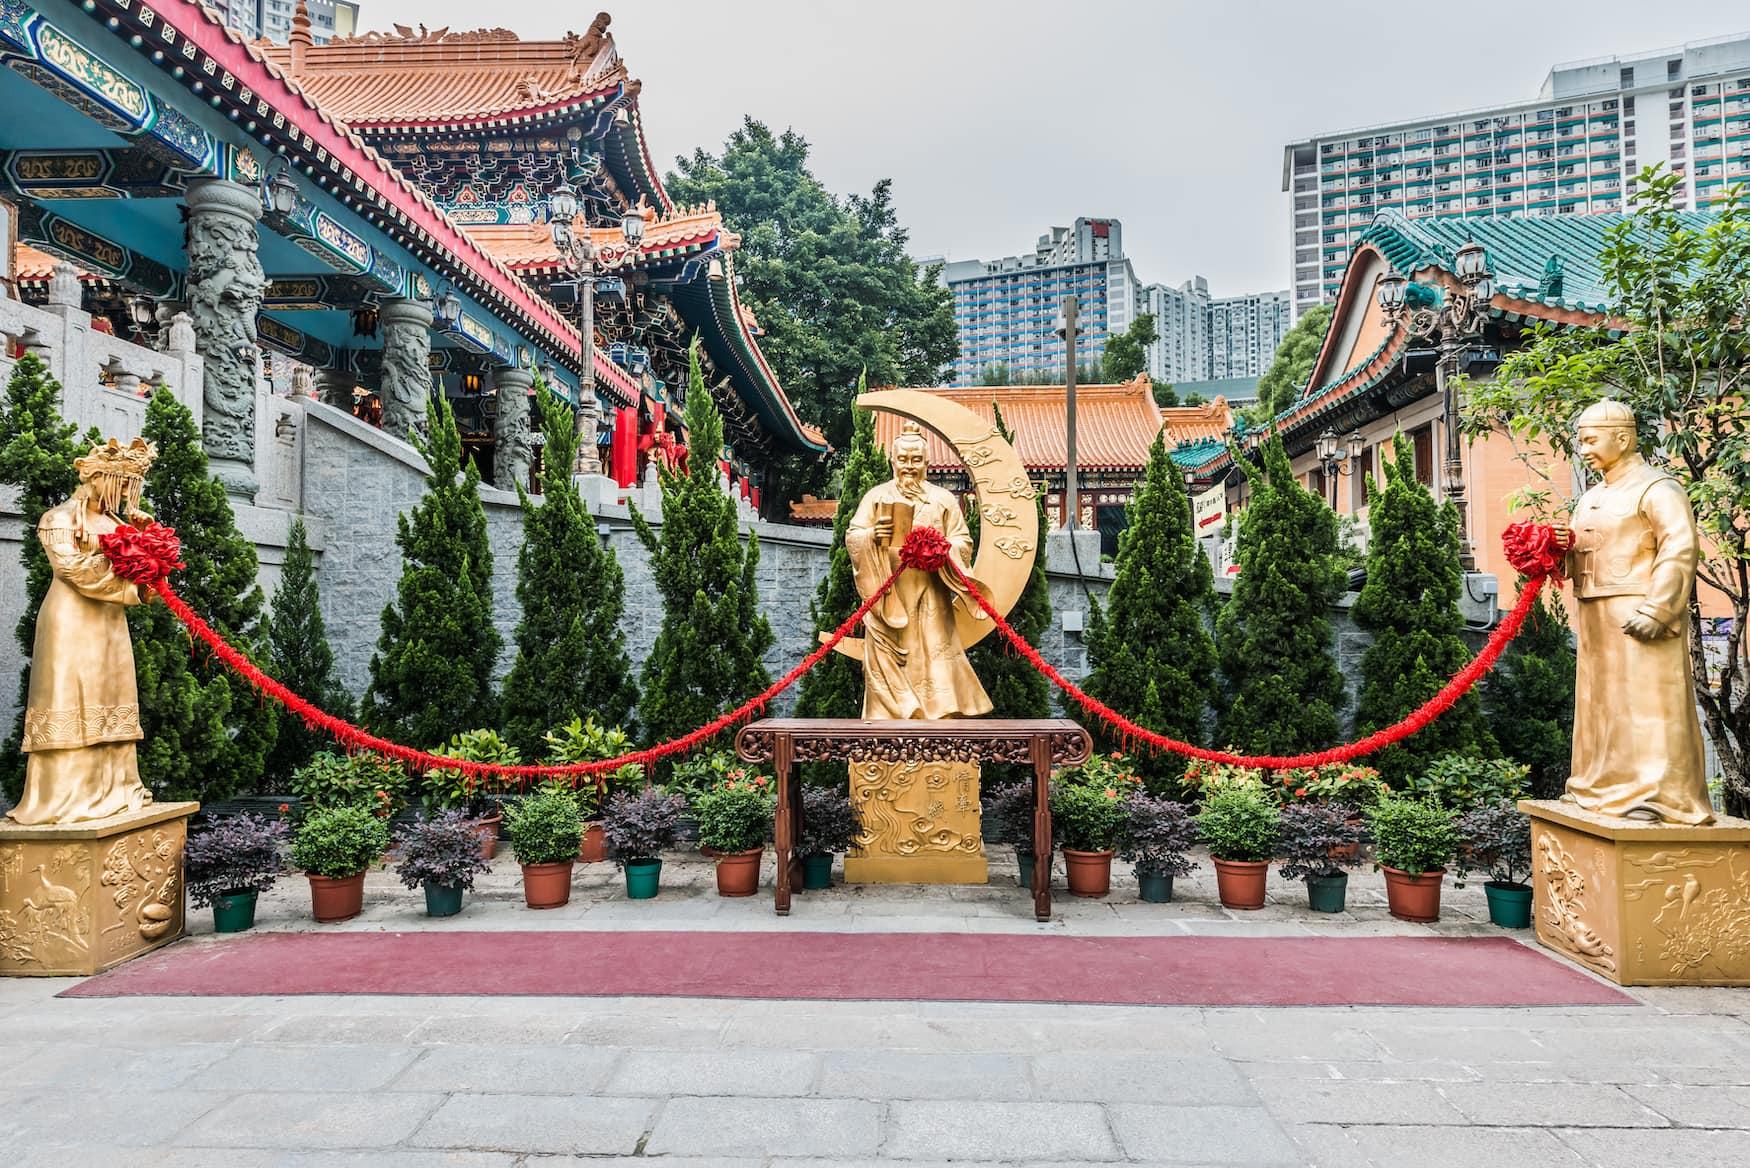 Goldene Statuen am Wong Tai Sin Tempel in Hongkong